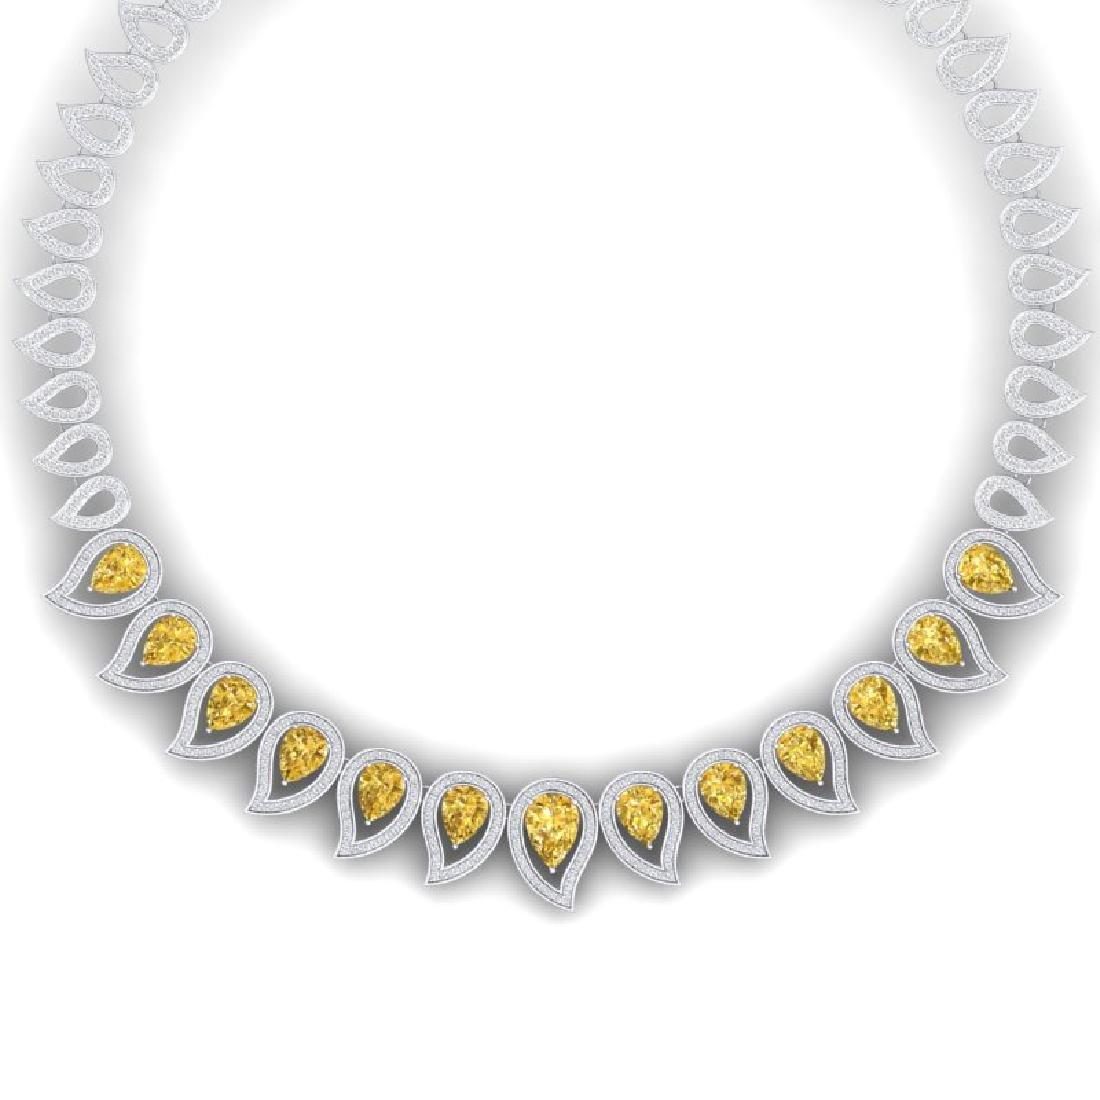 31.74 CTW Royalty Canary Citrine & VS Diamond Necklace